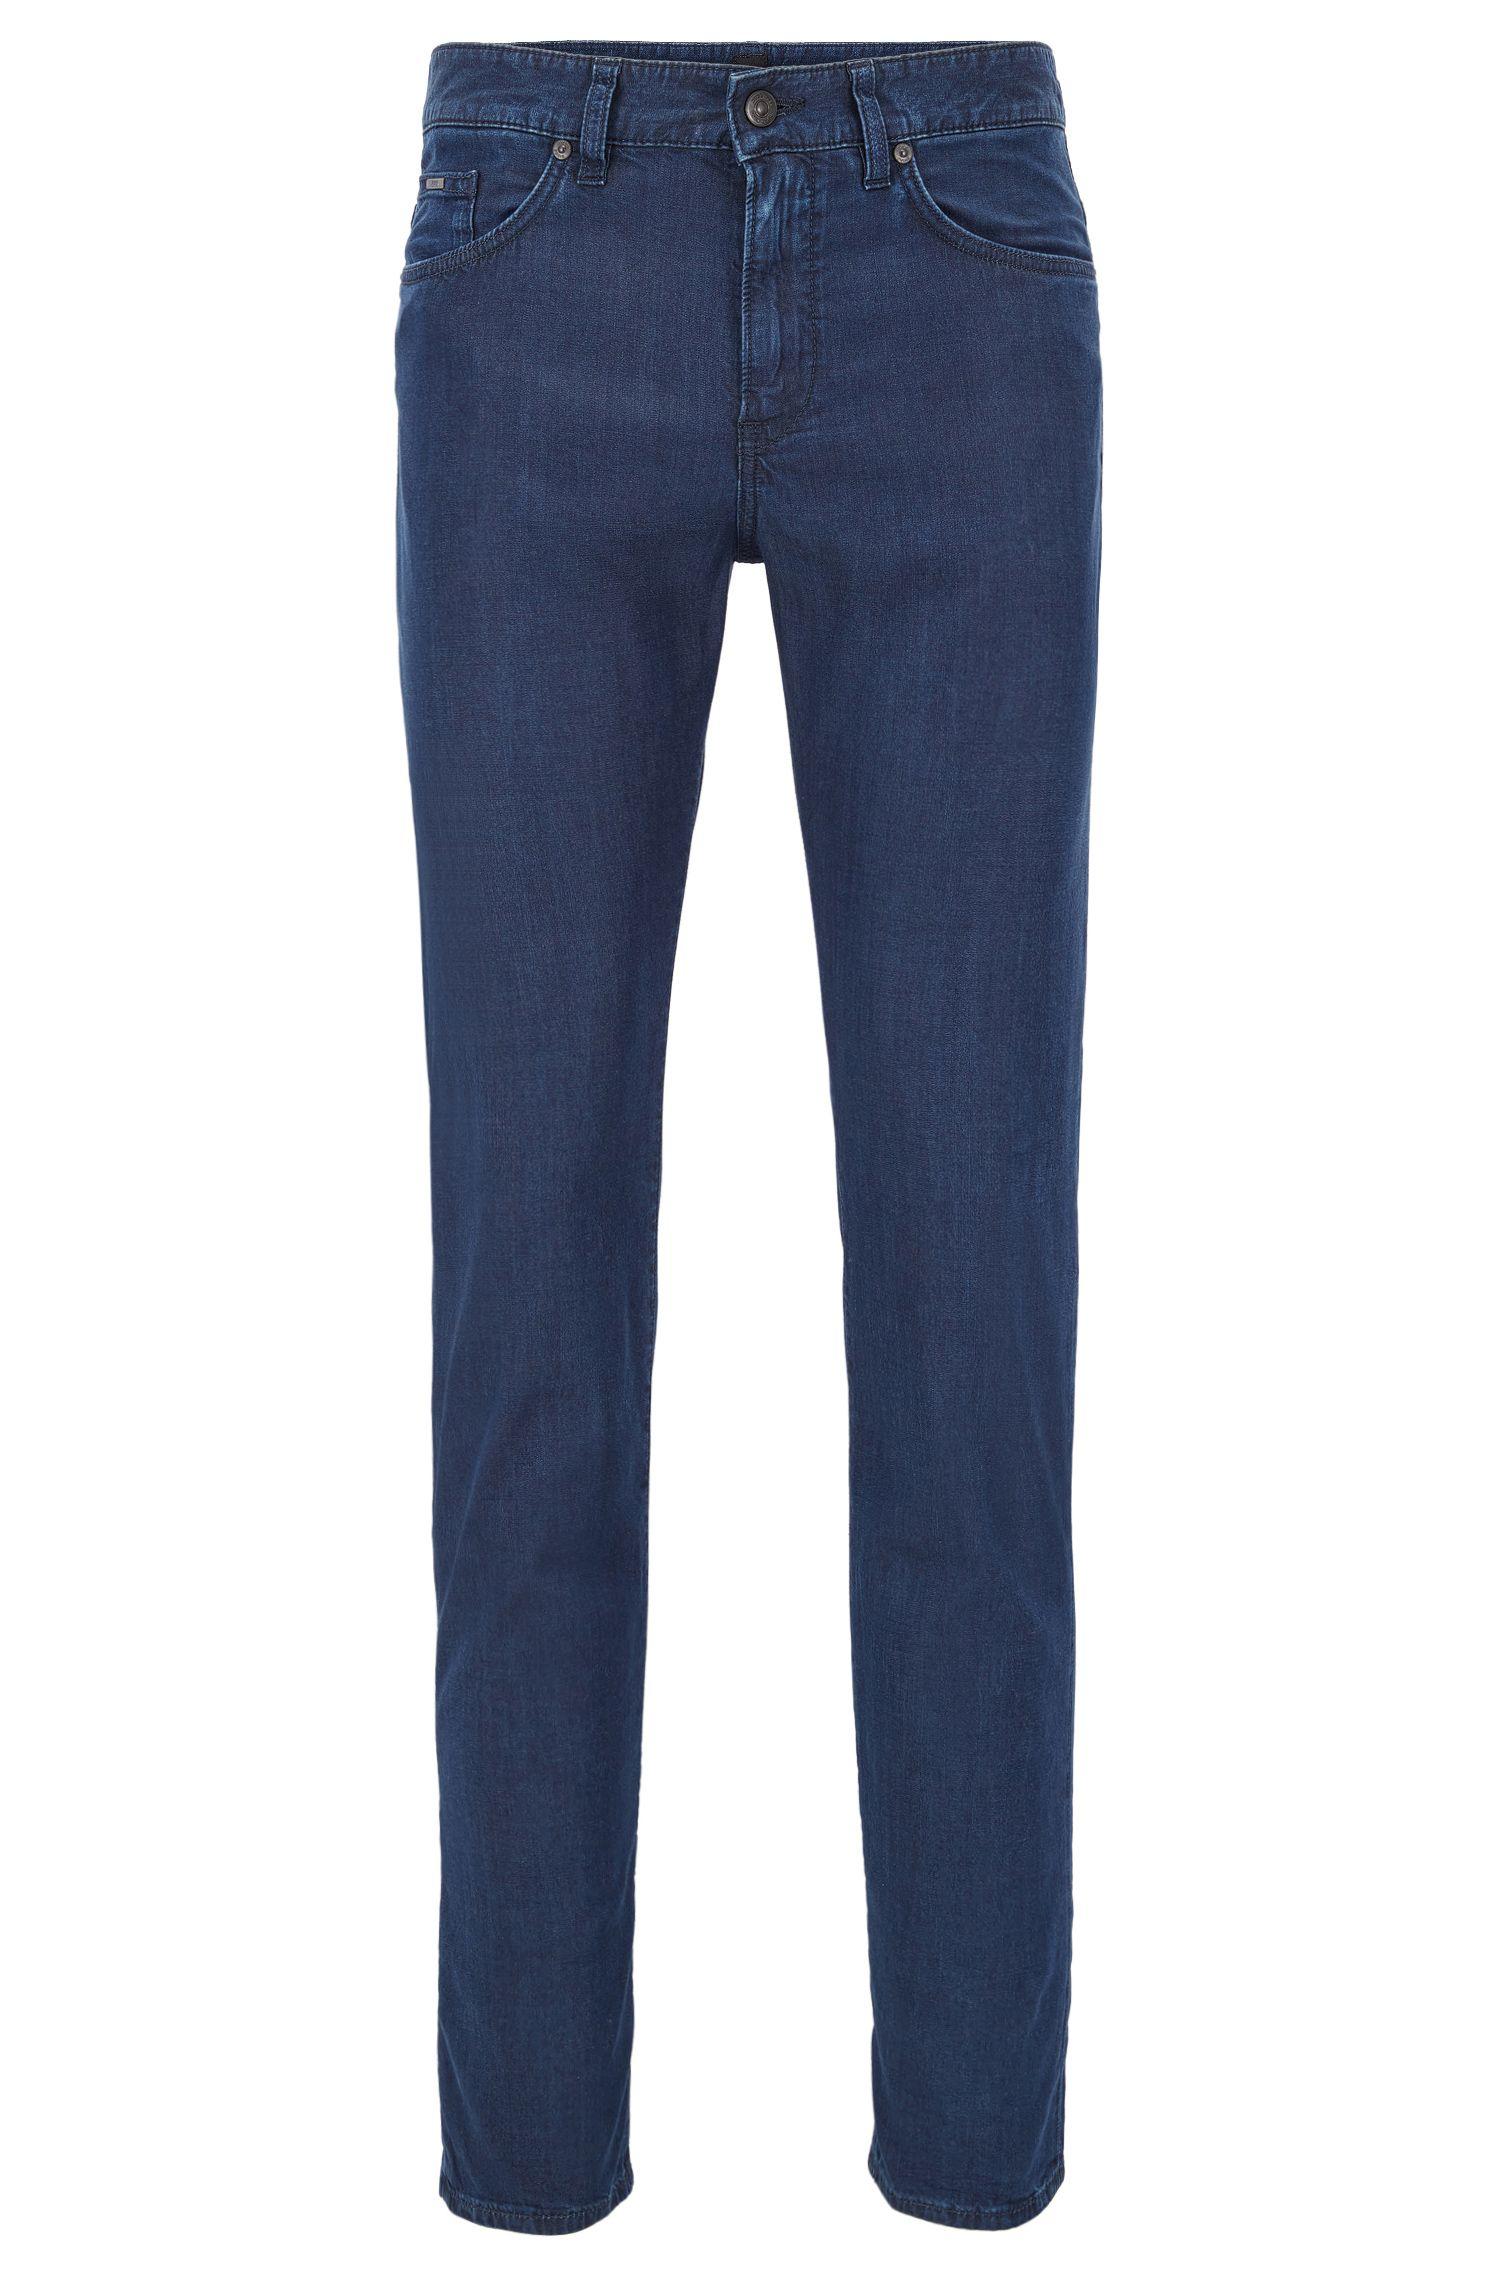 Slim-Fit Jeans aus leichtem Stretch-Denim